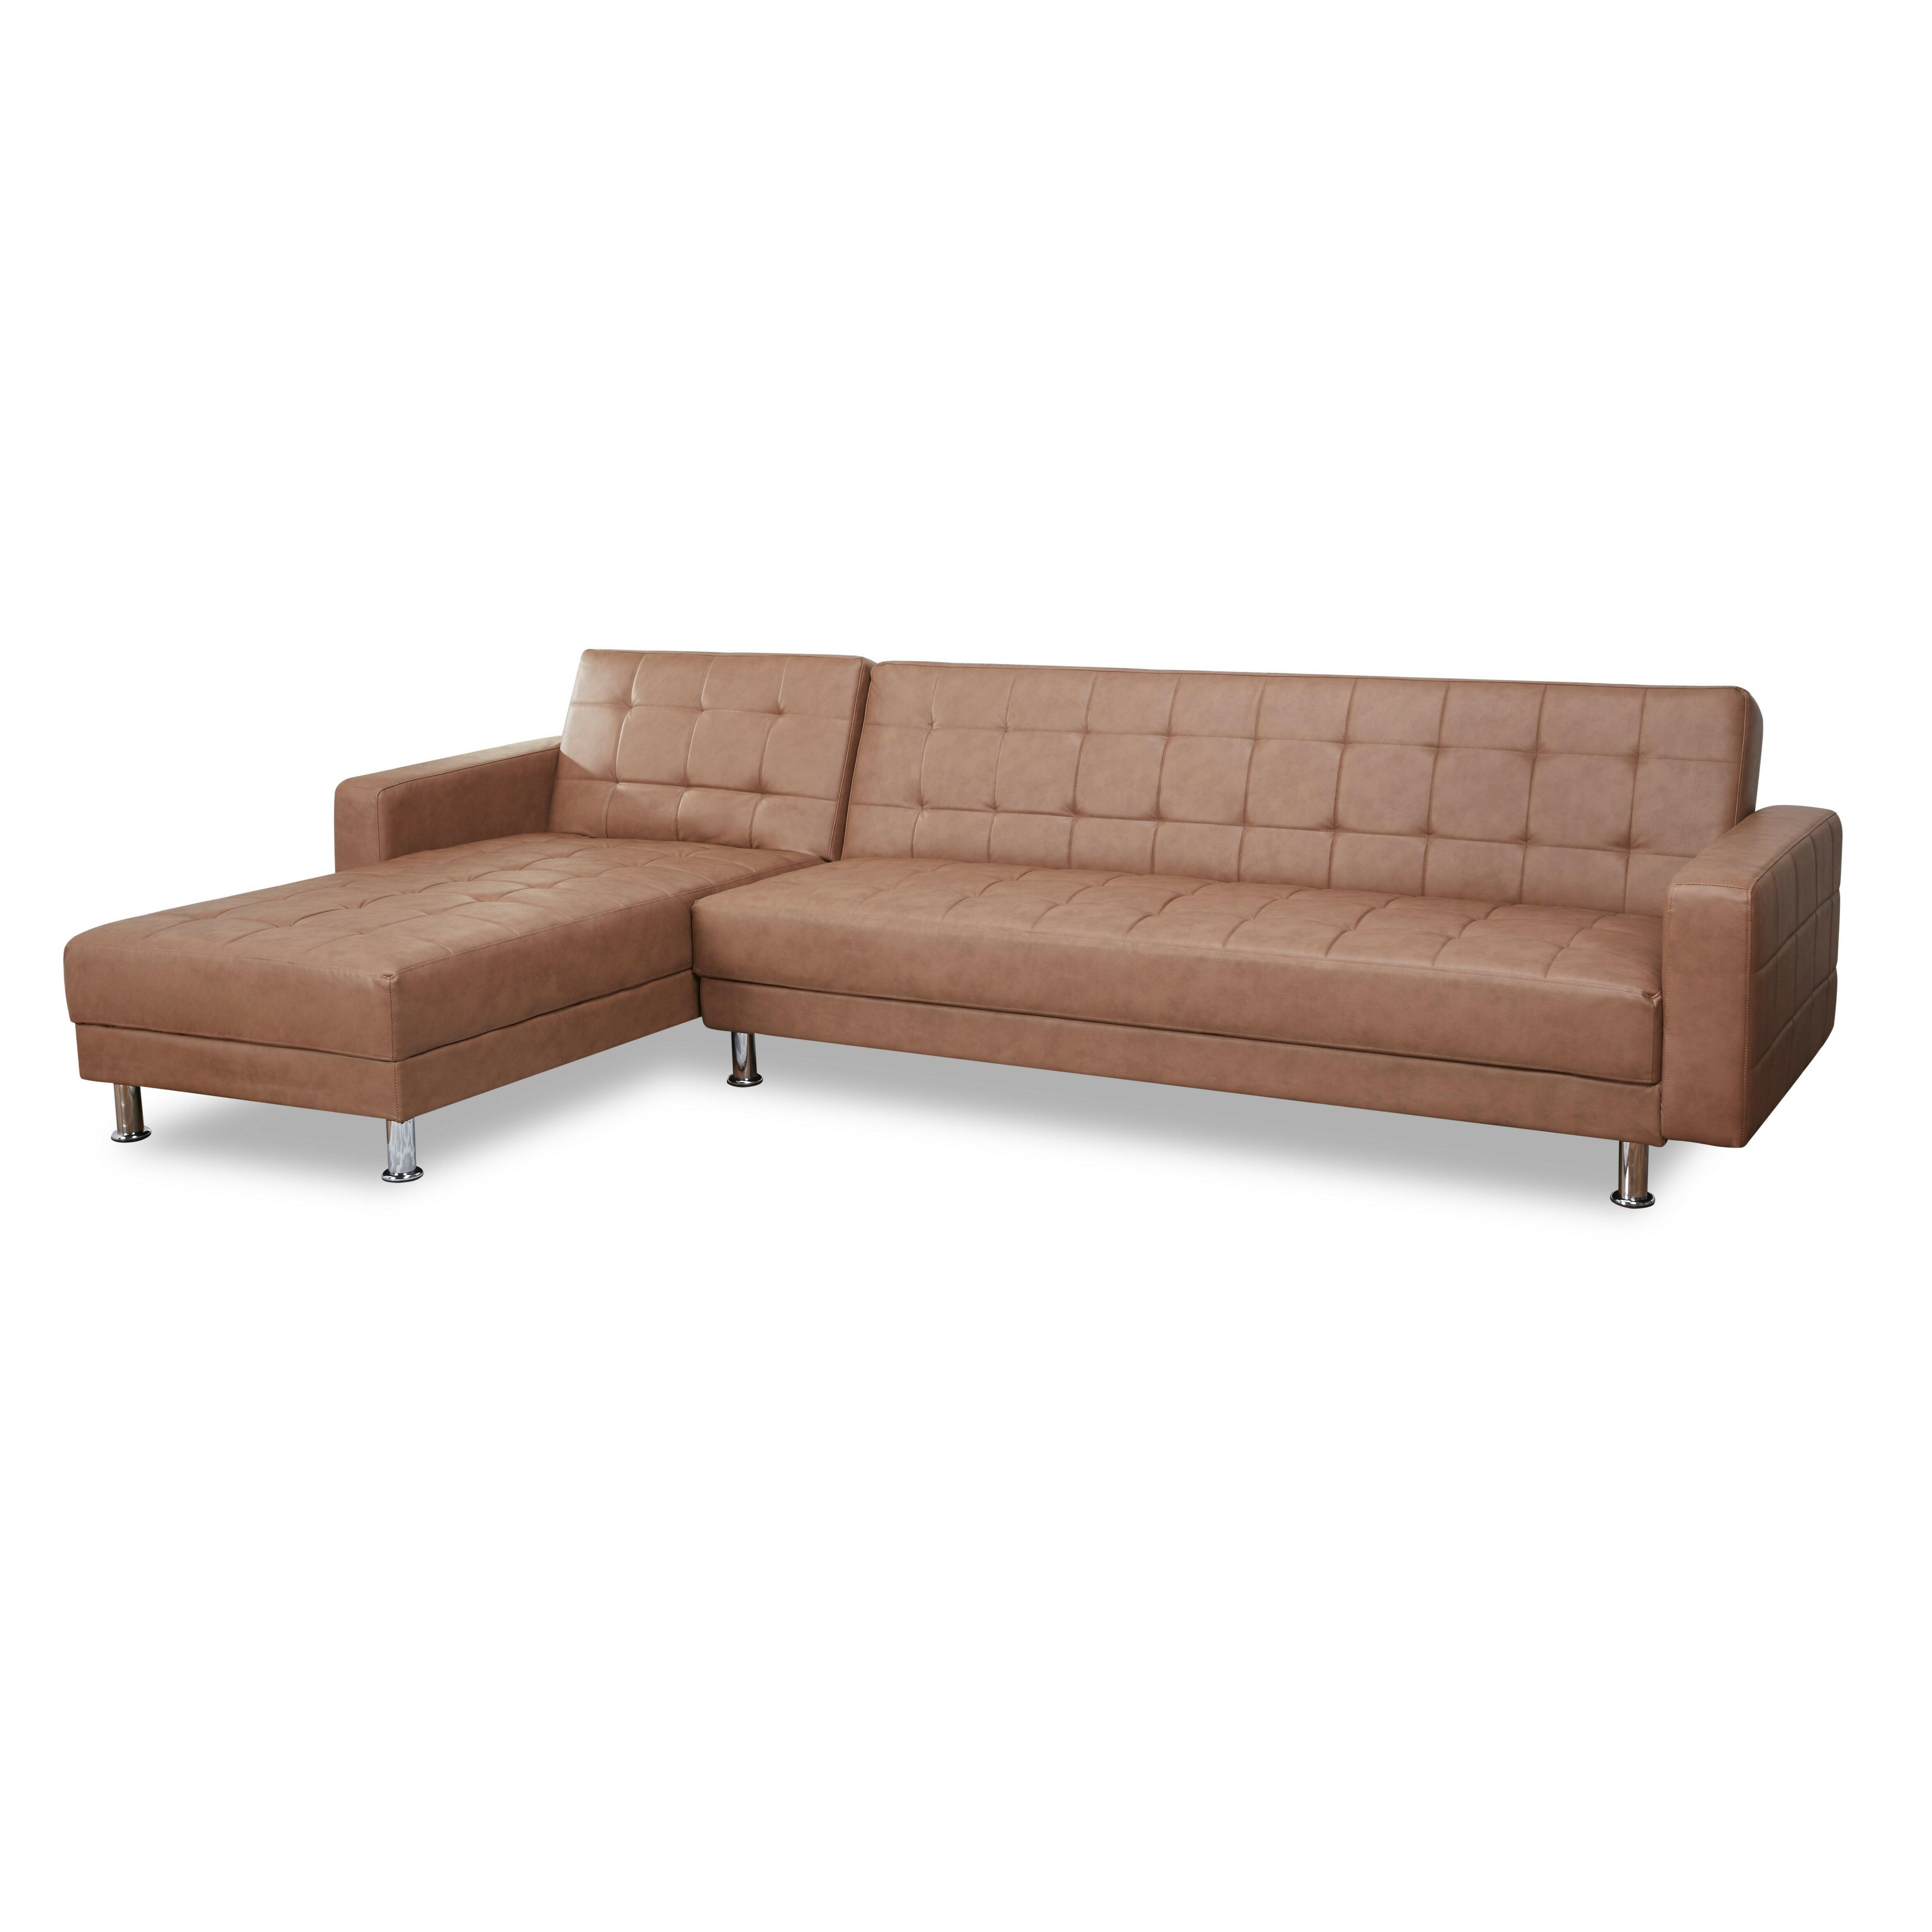 Leader Lifestyle Spencer Reversible Chaise Corner Sofa